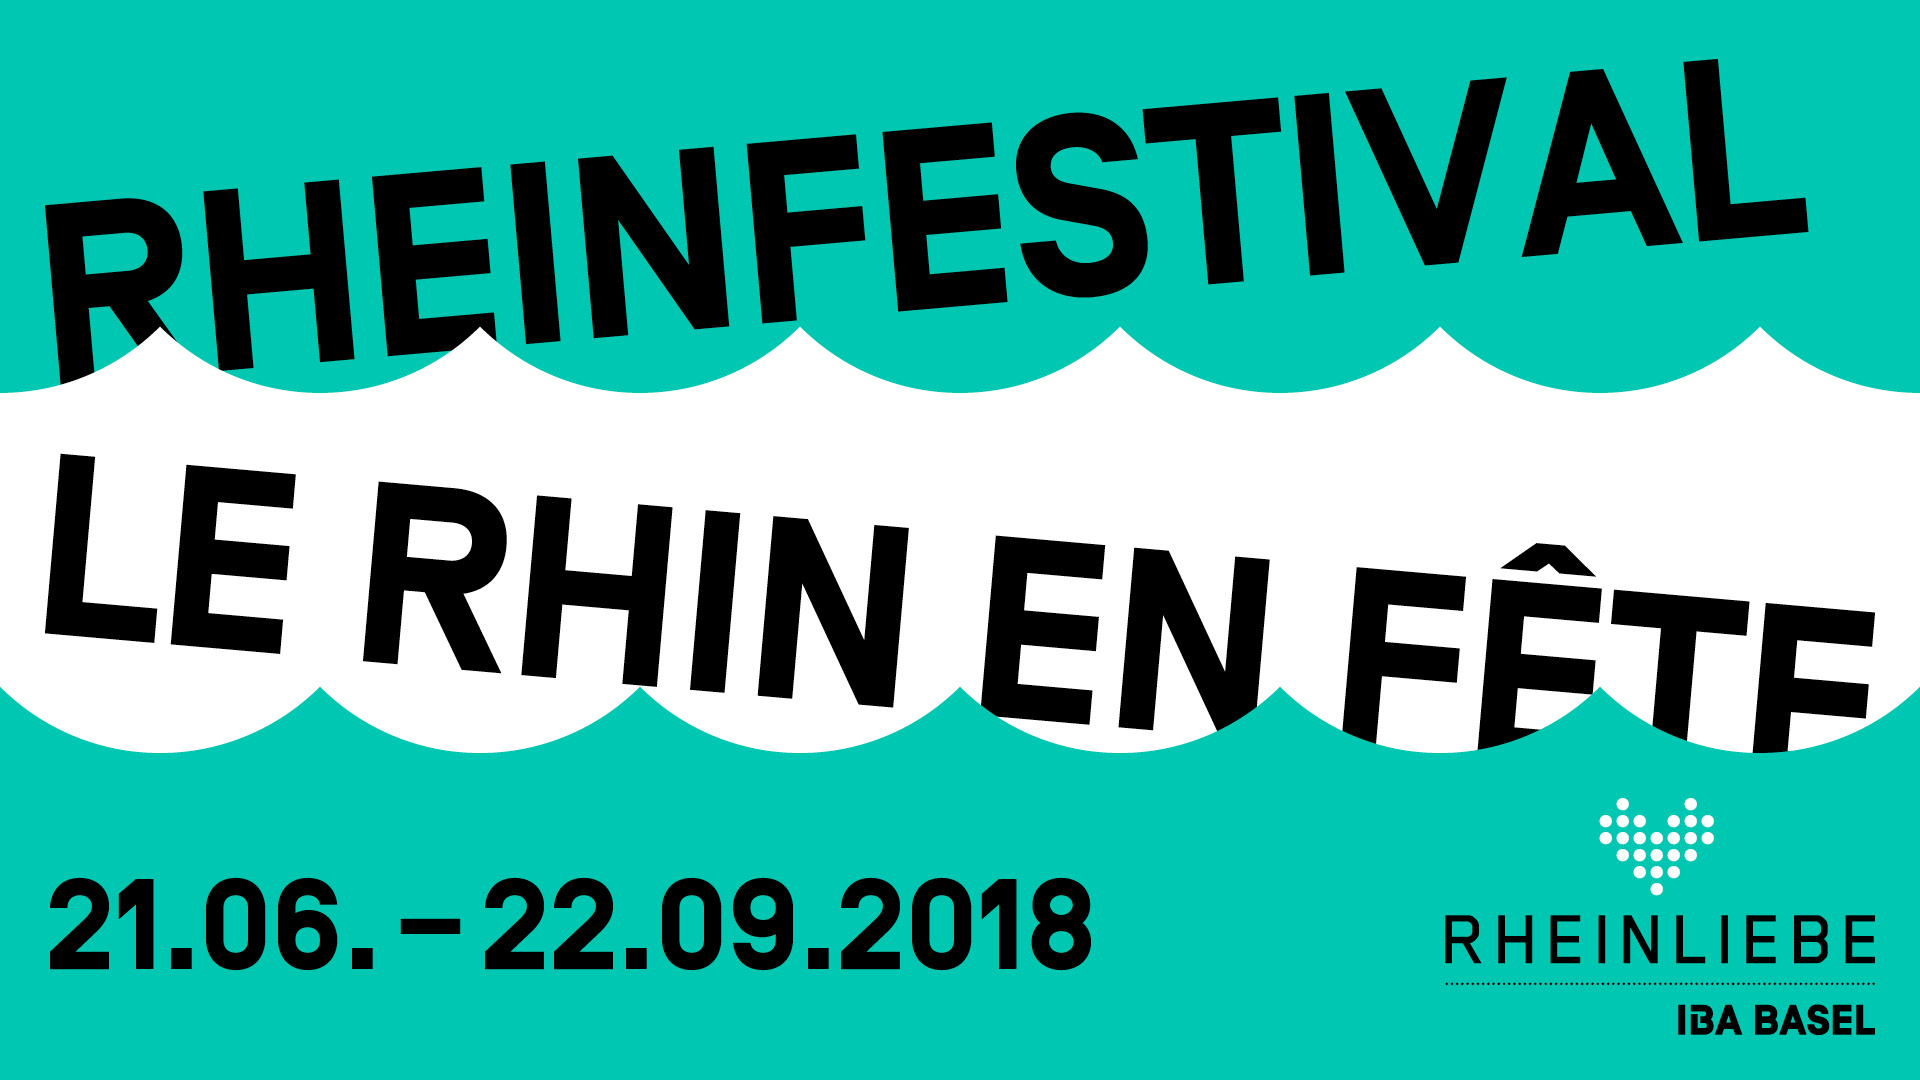 IBA Rheinfestival